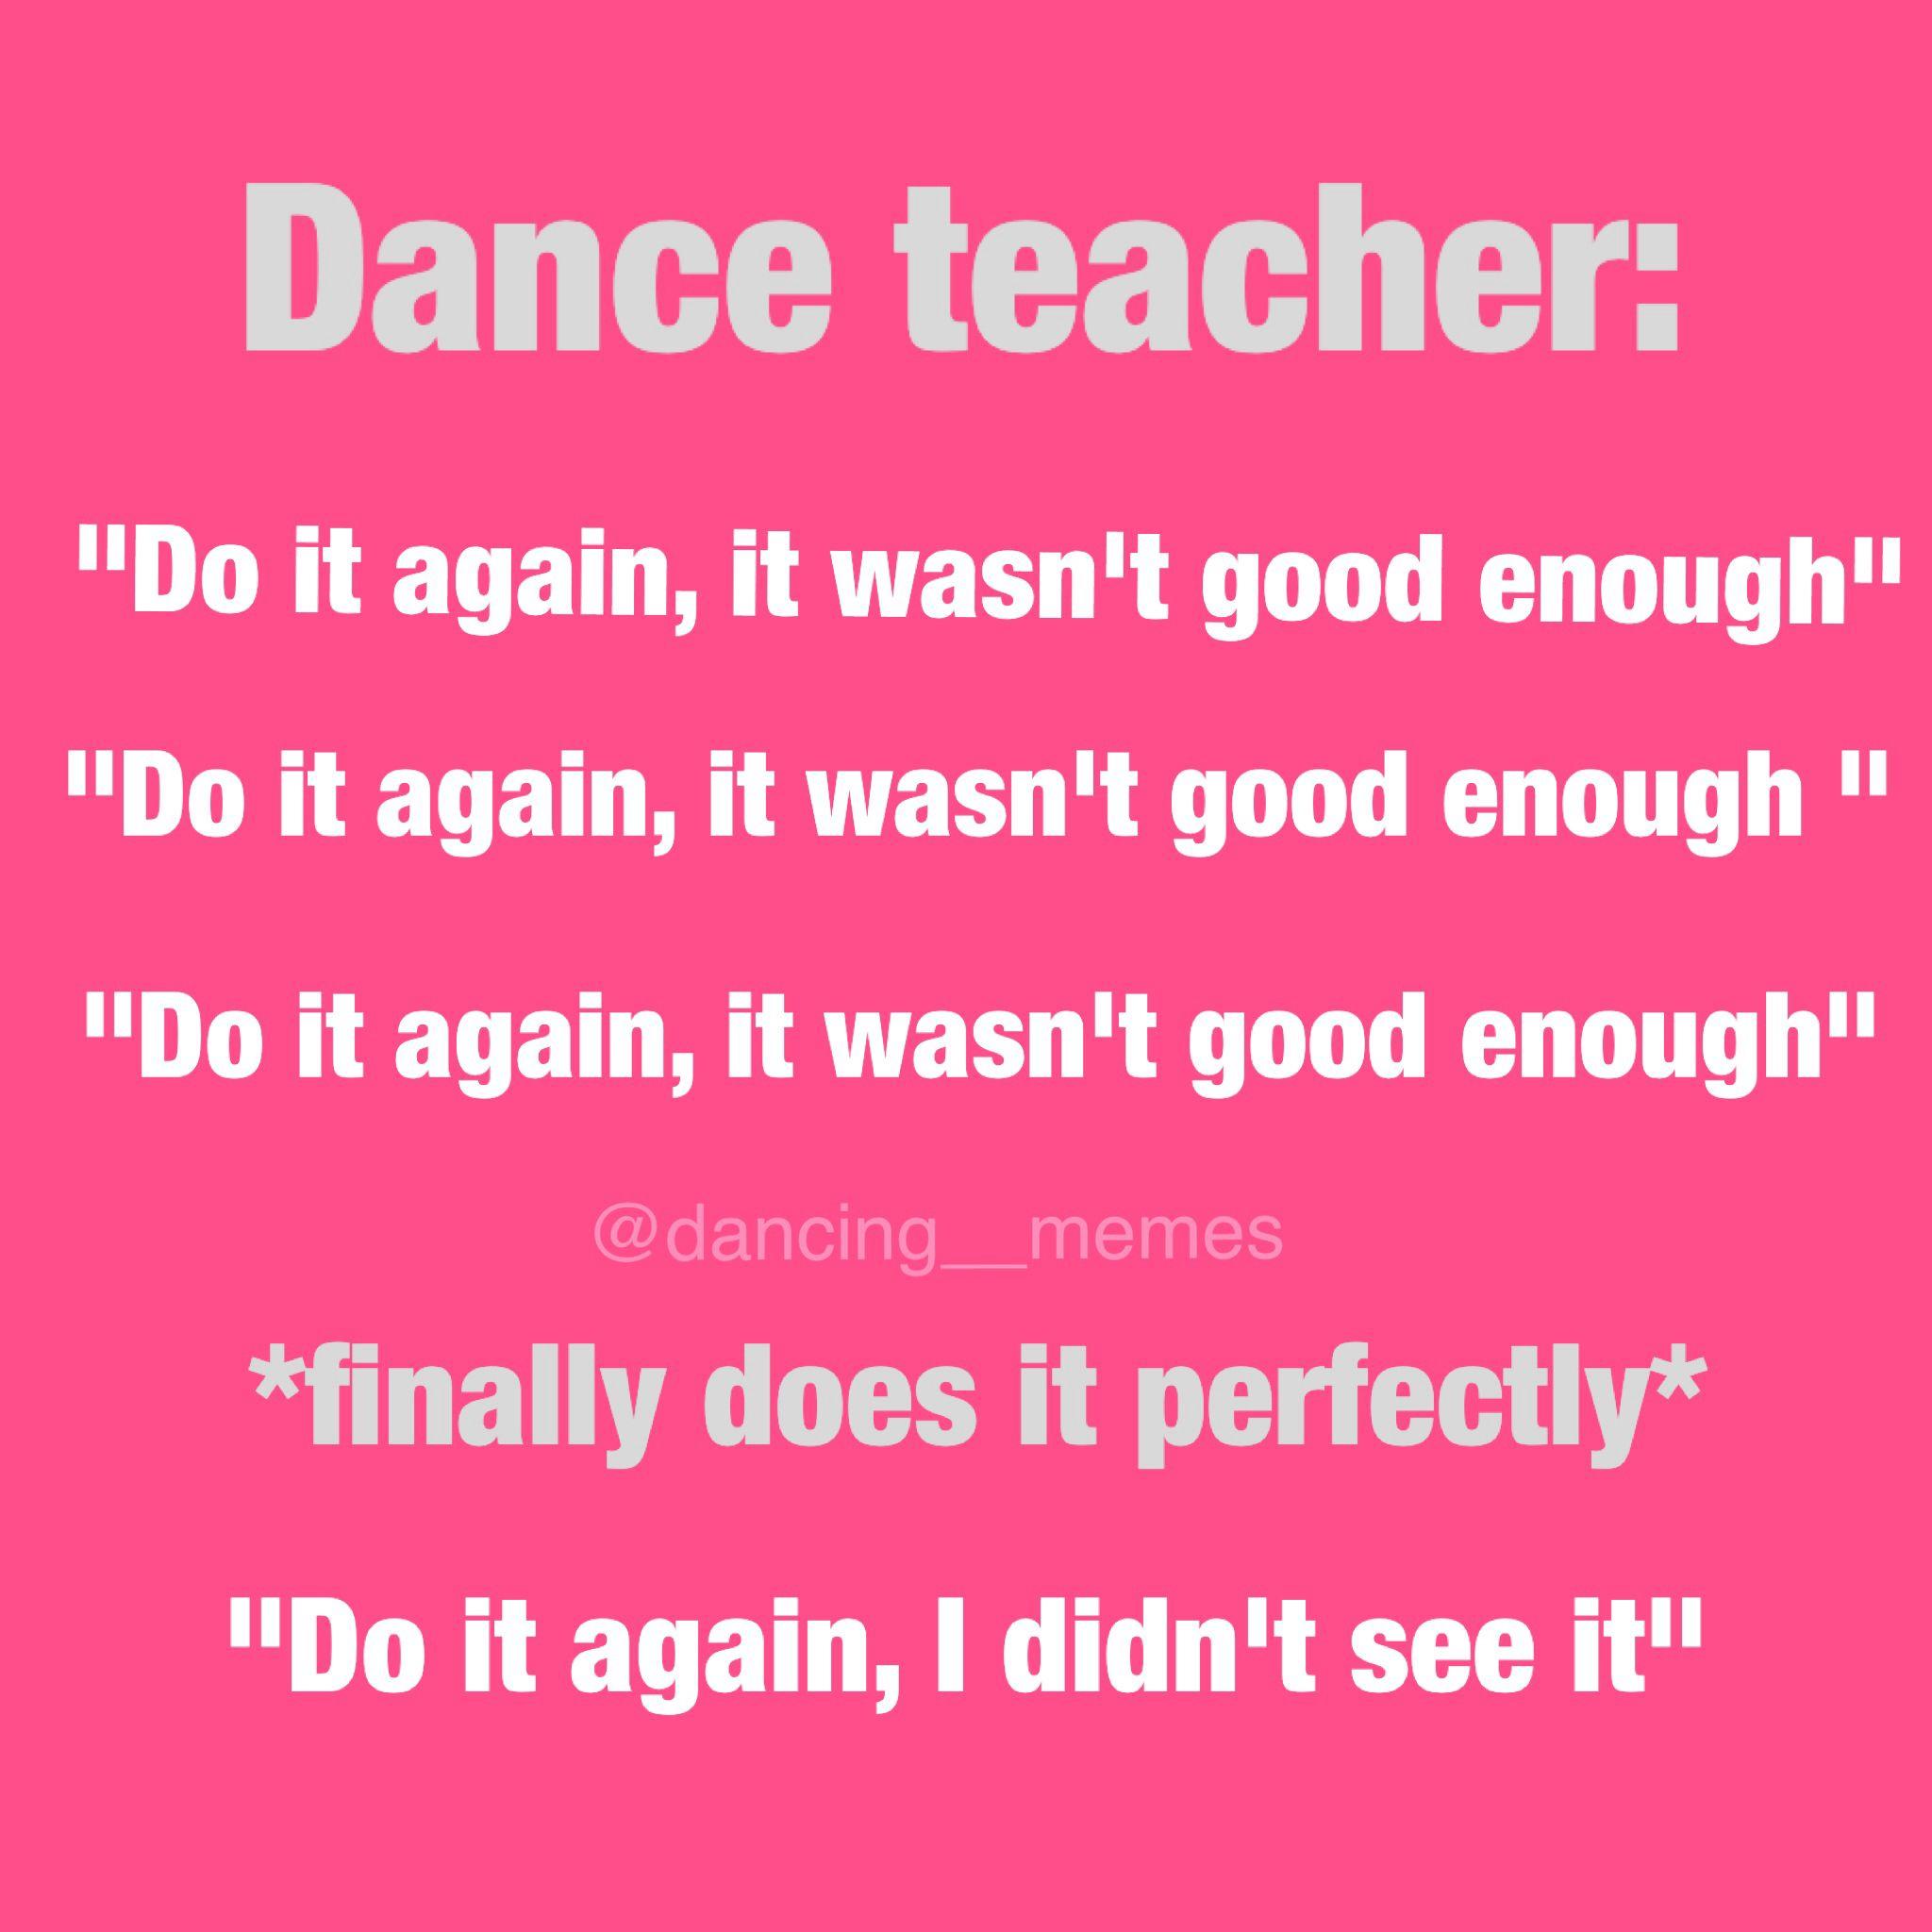 Funny Dance Meme Images : Dancing memes funny dance ballet instagram account